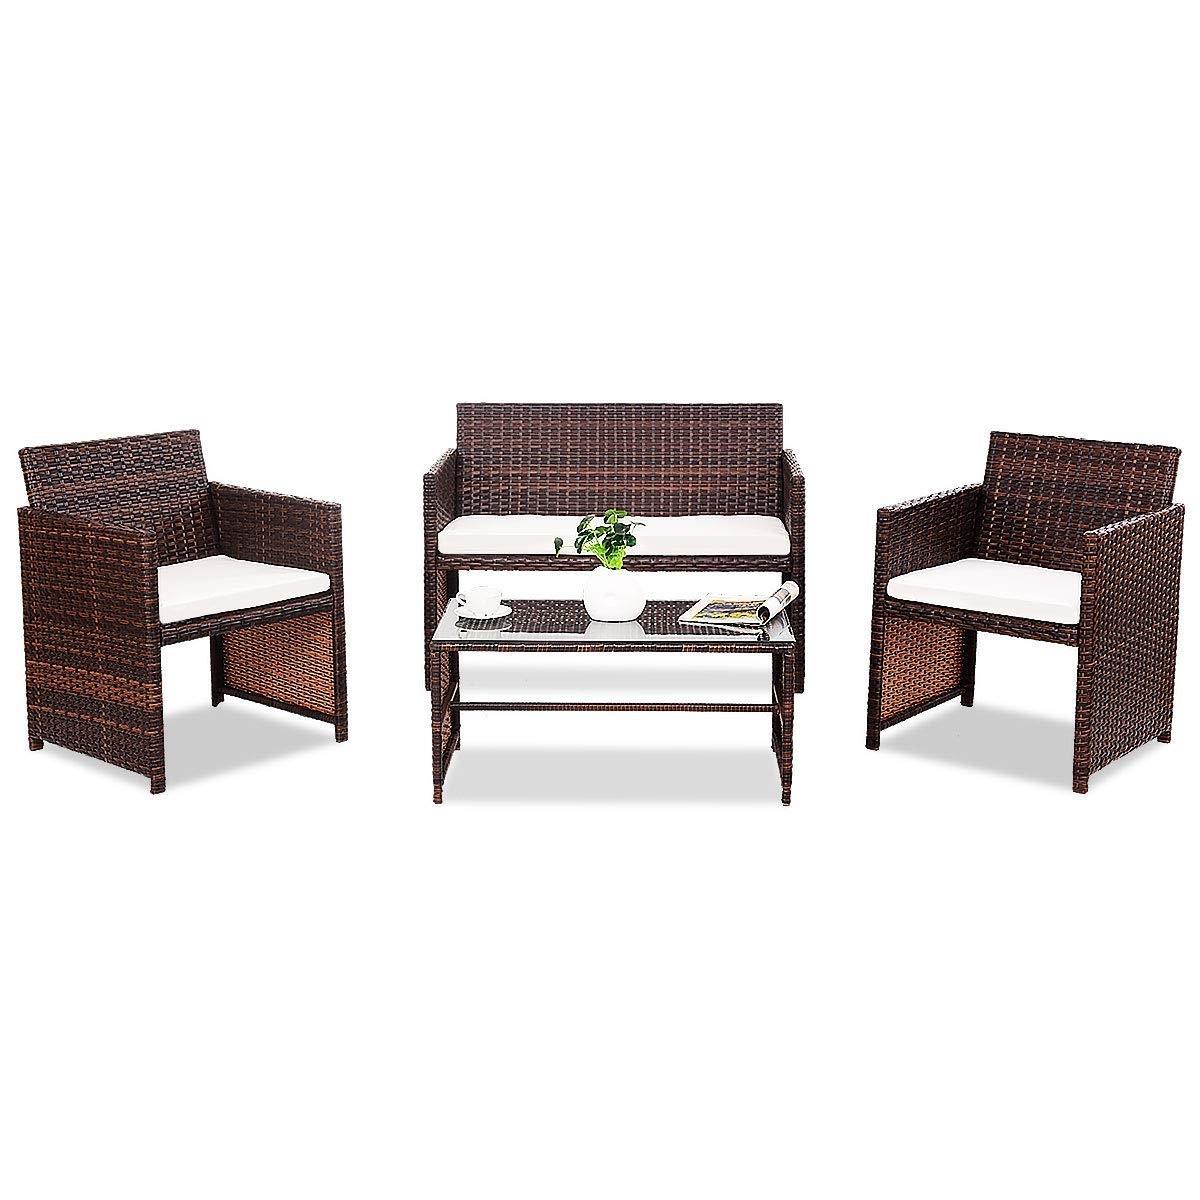 4 pcs Sofa Cushioned Seat Furniture Set